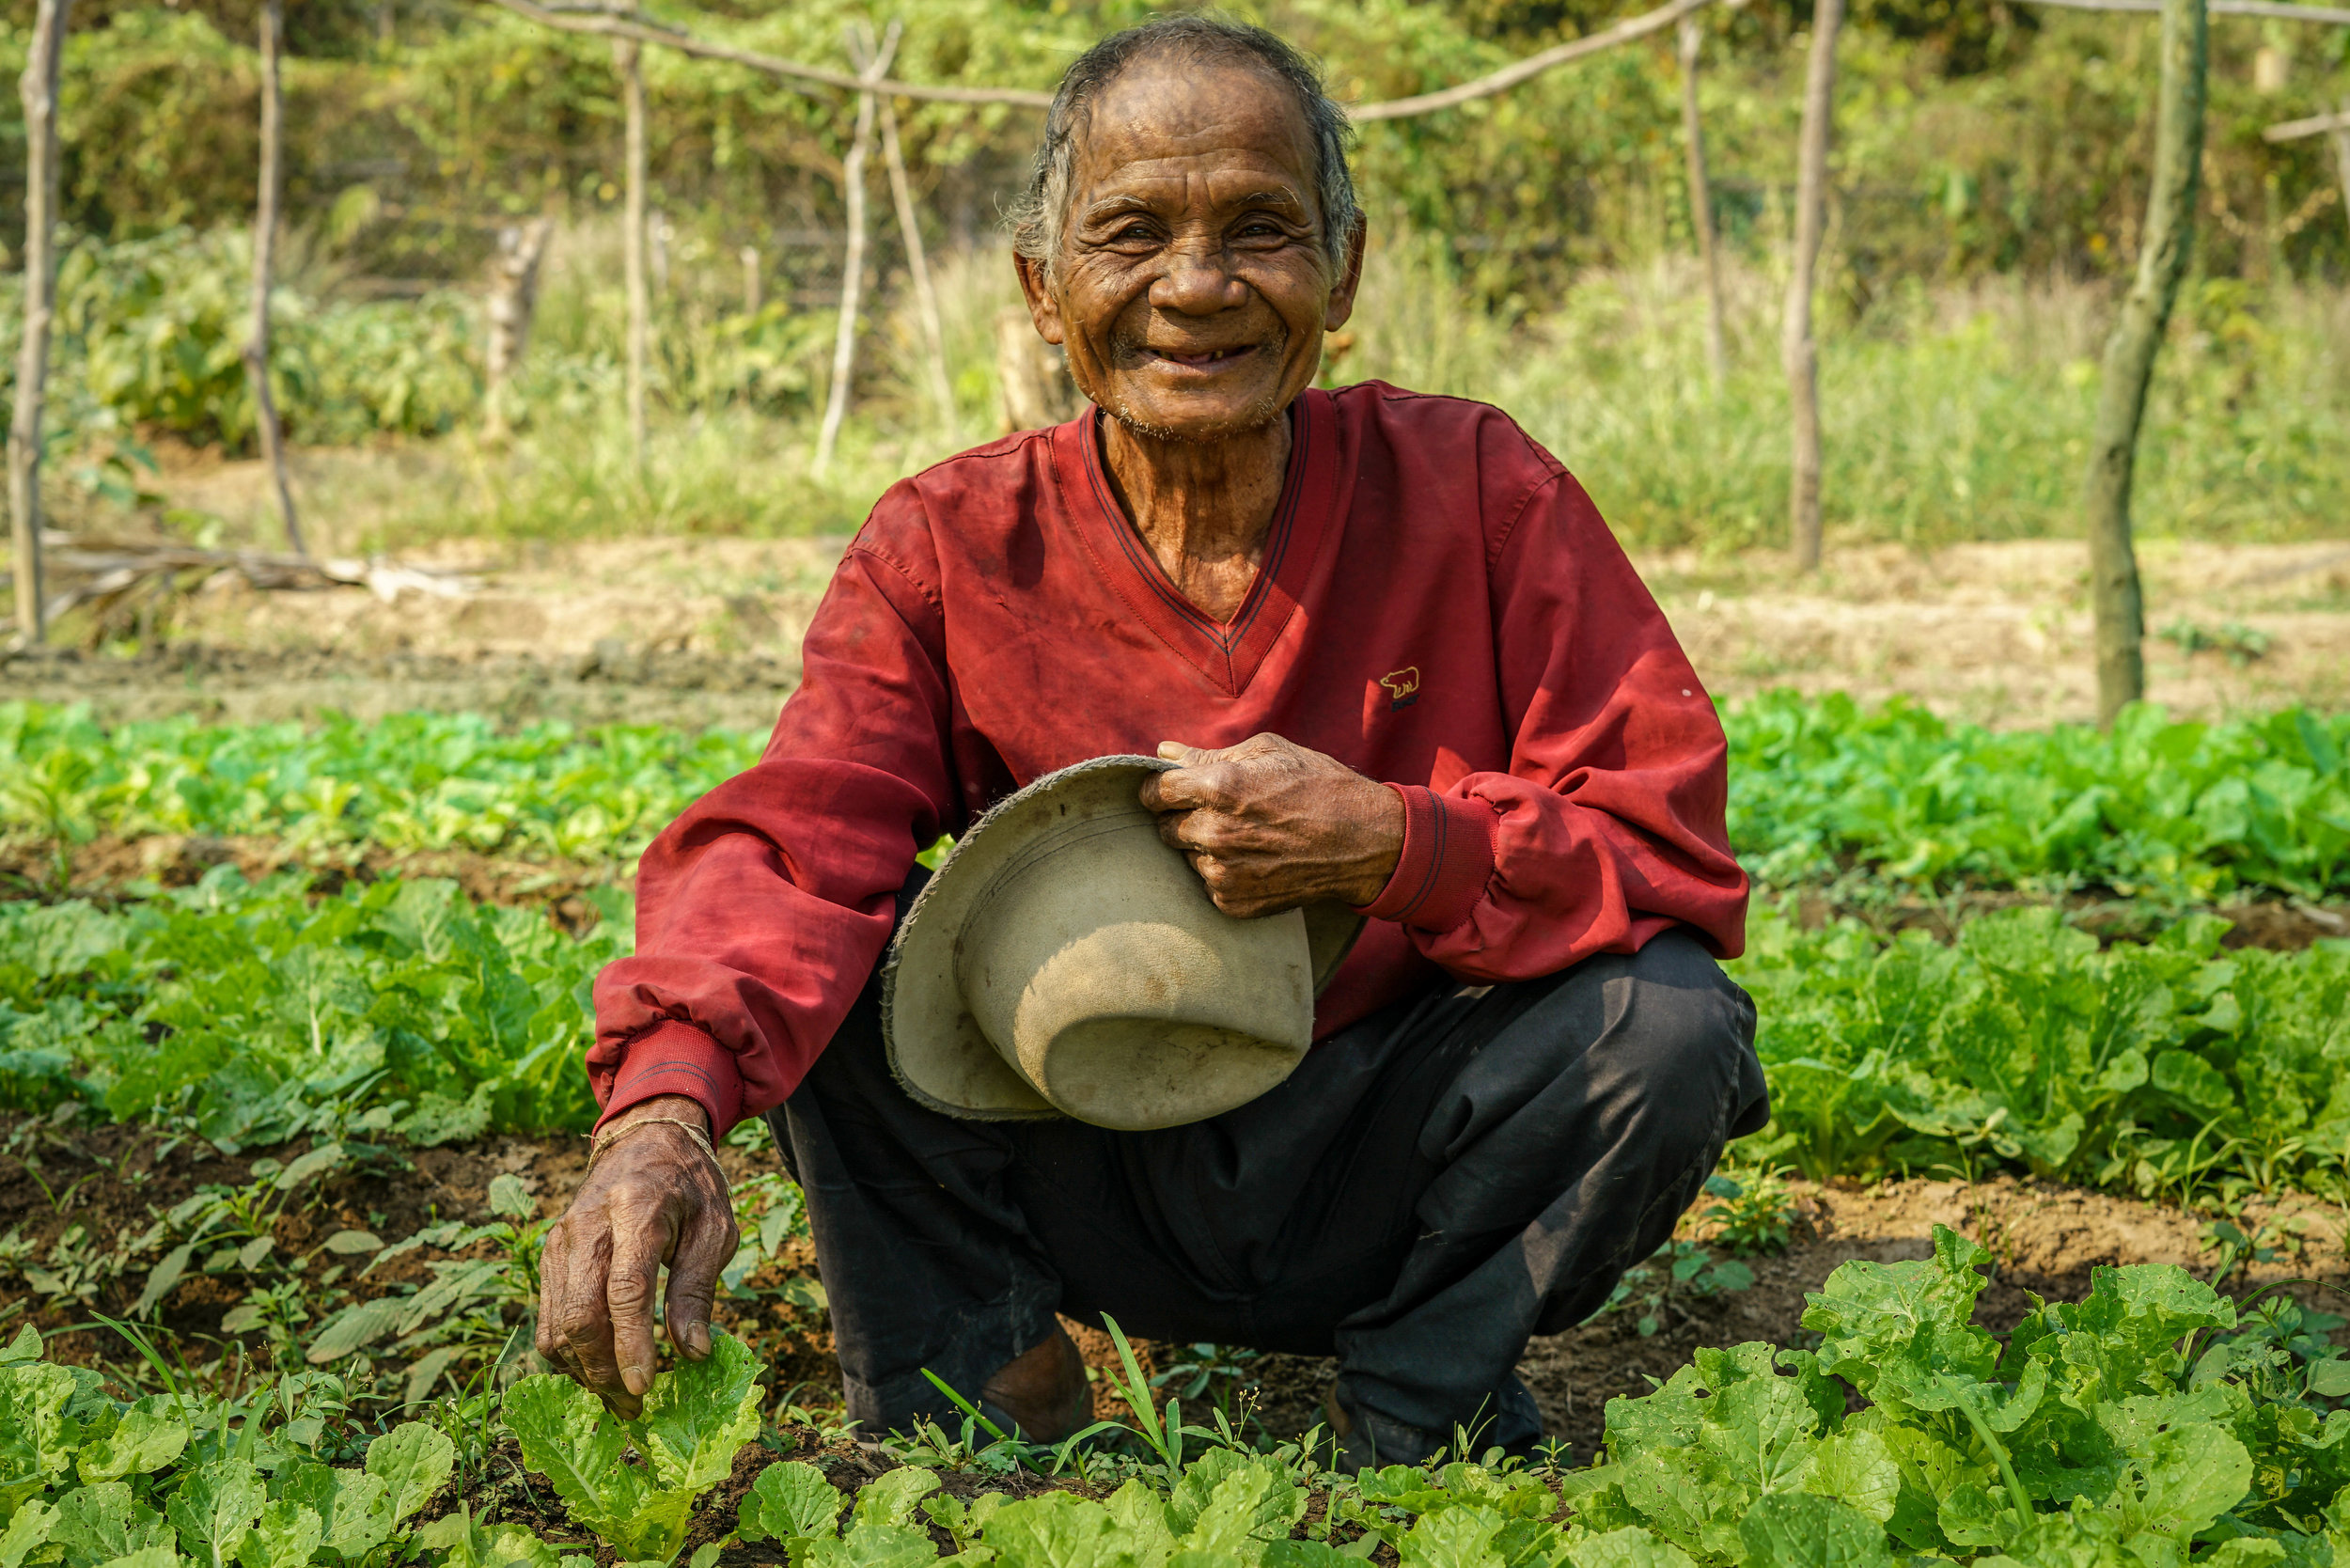 Farmer in his garden | Cambodia   ©LaurenKanaChan